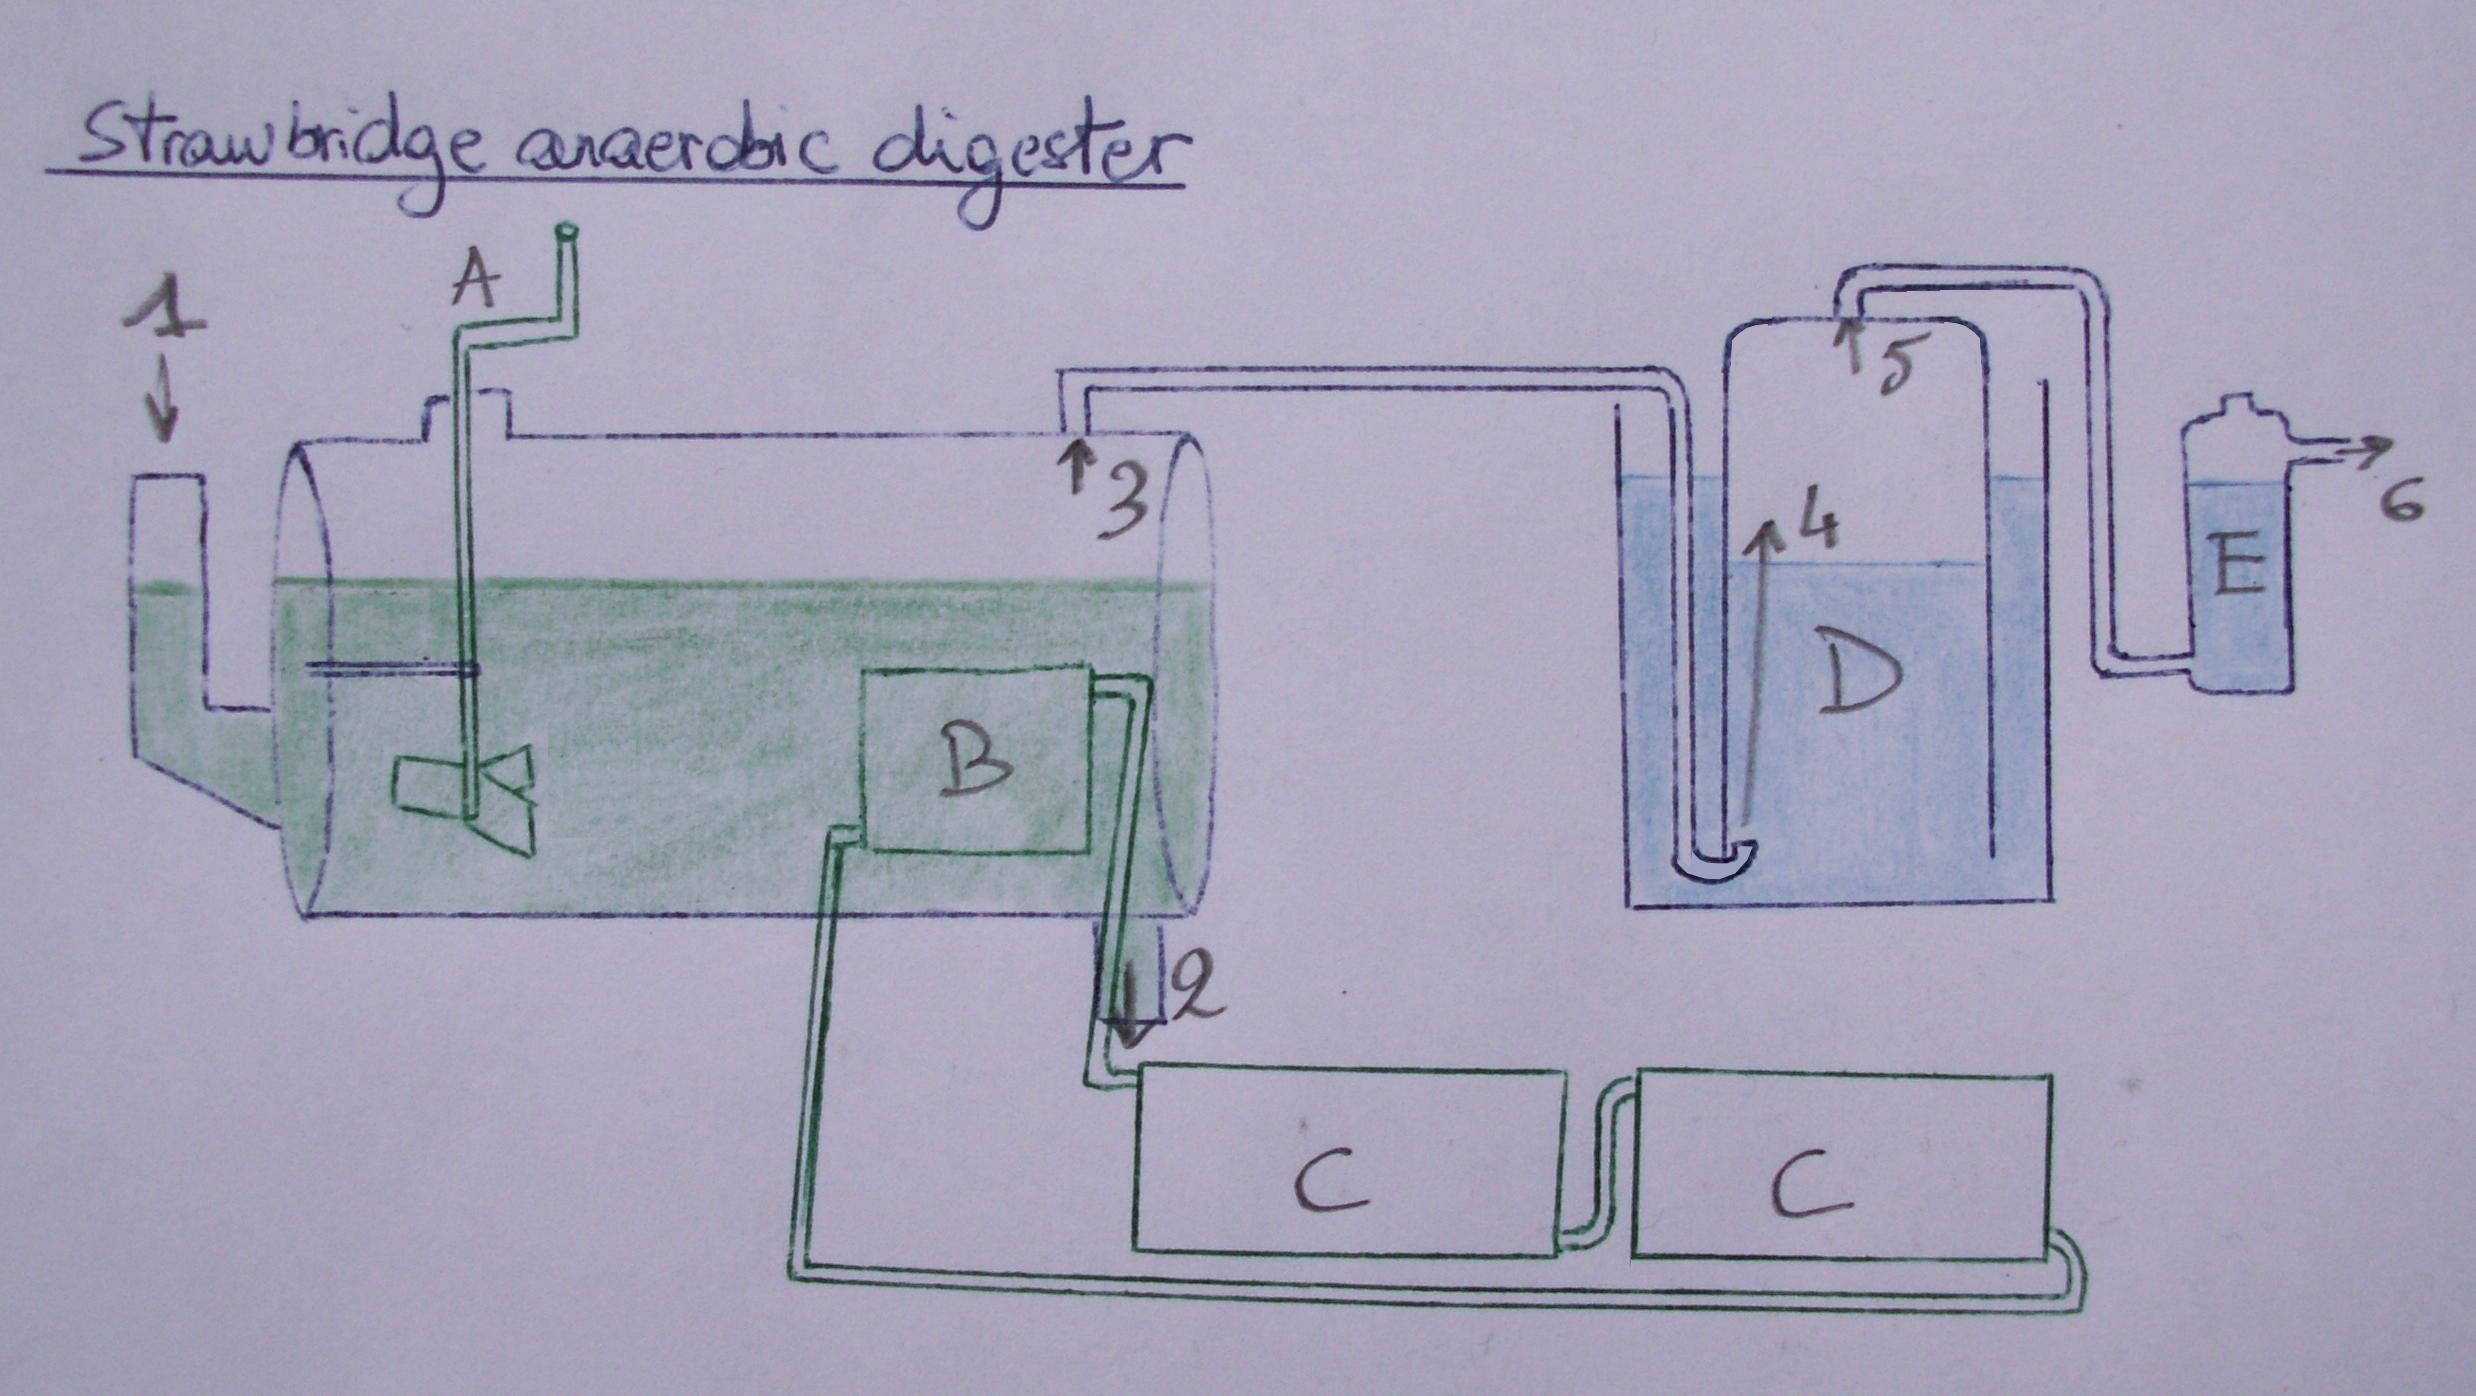 File:DIY anaerobic digester.JPG